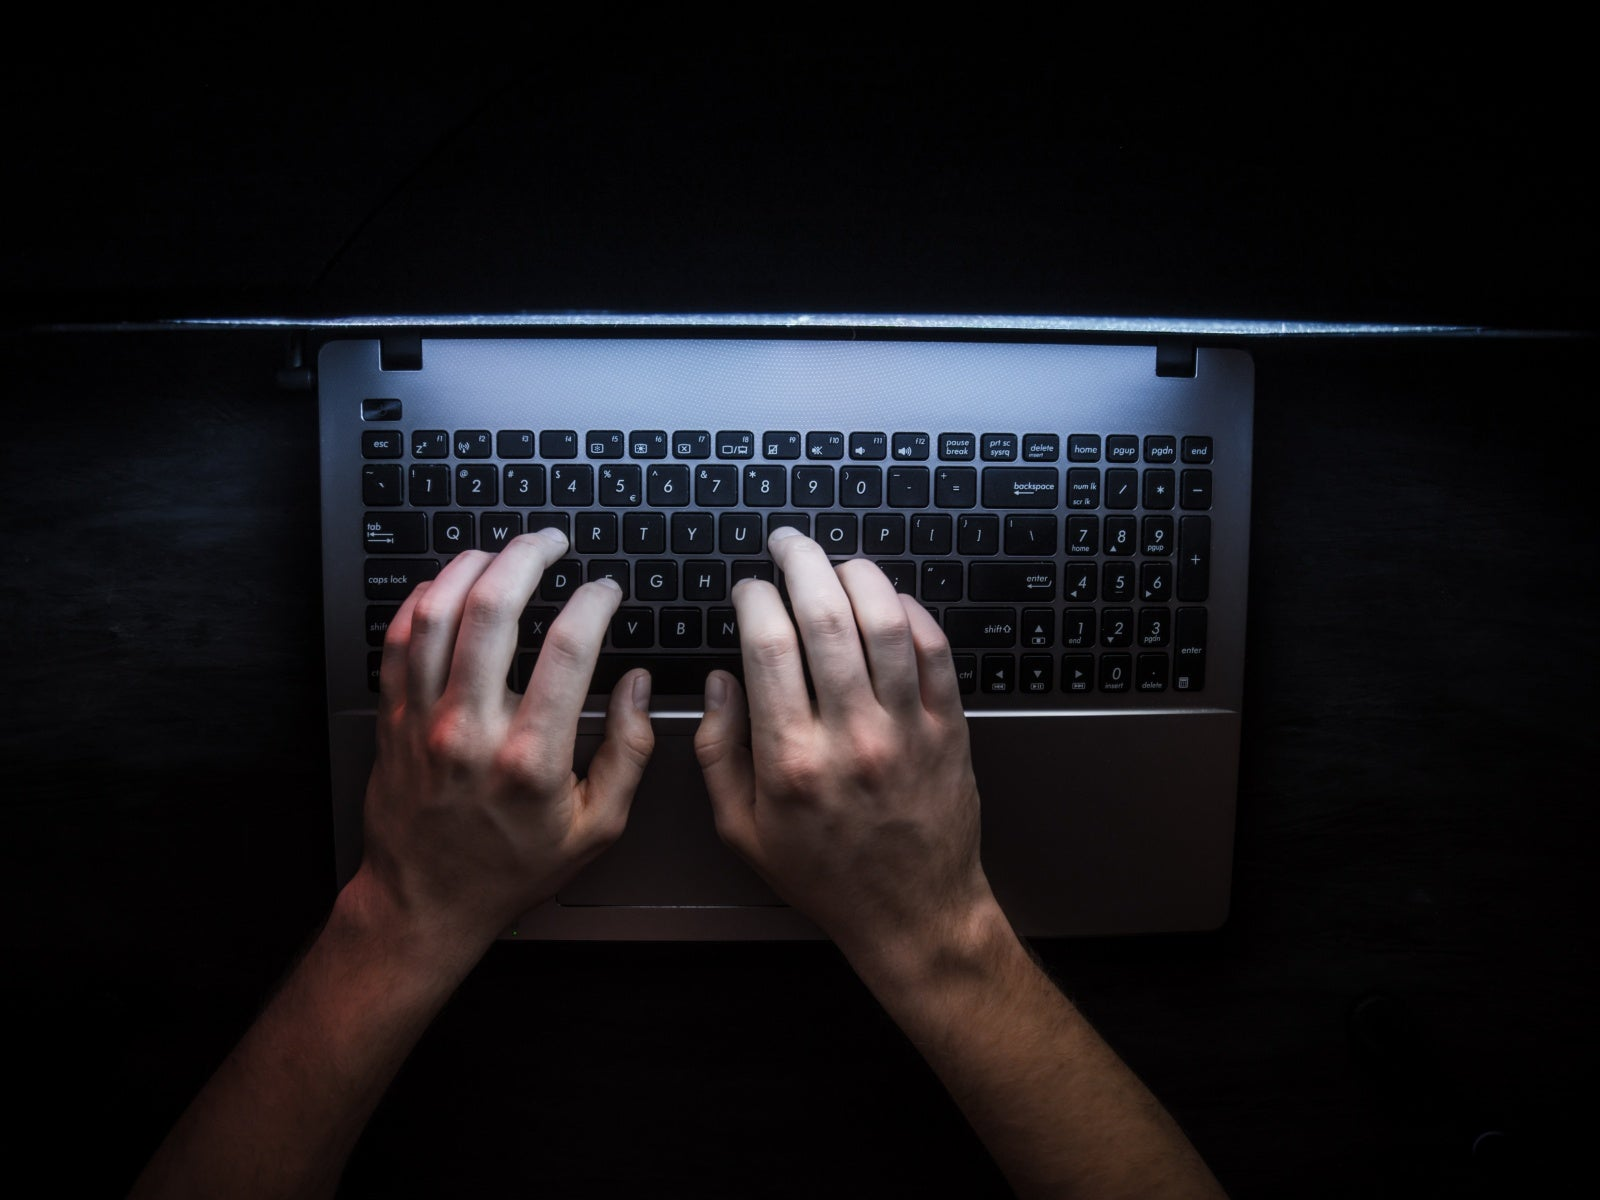 Australia's proposed new surveillance legislation: Combatting the dark web